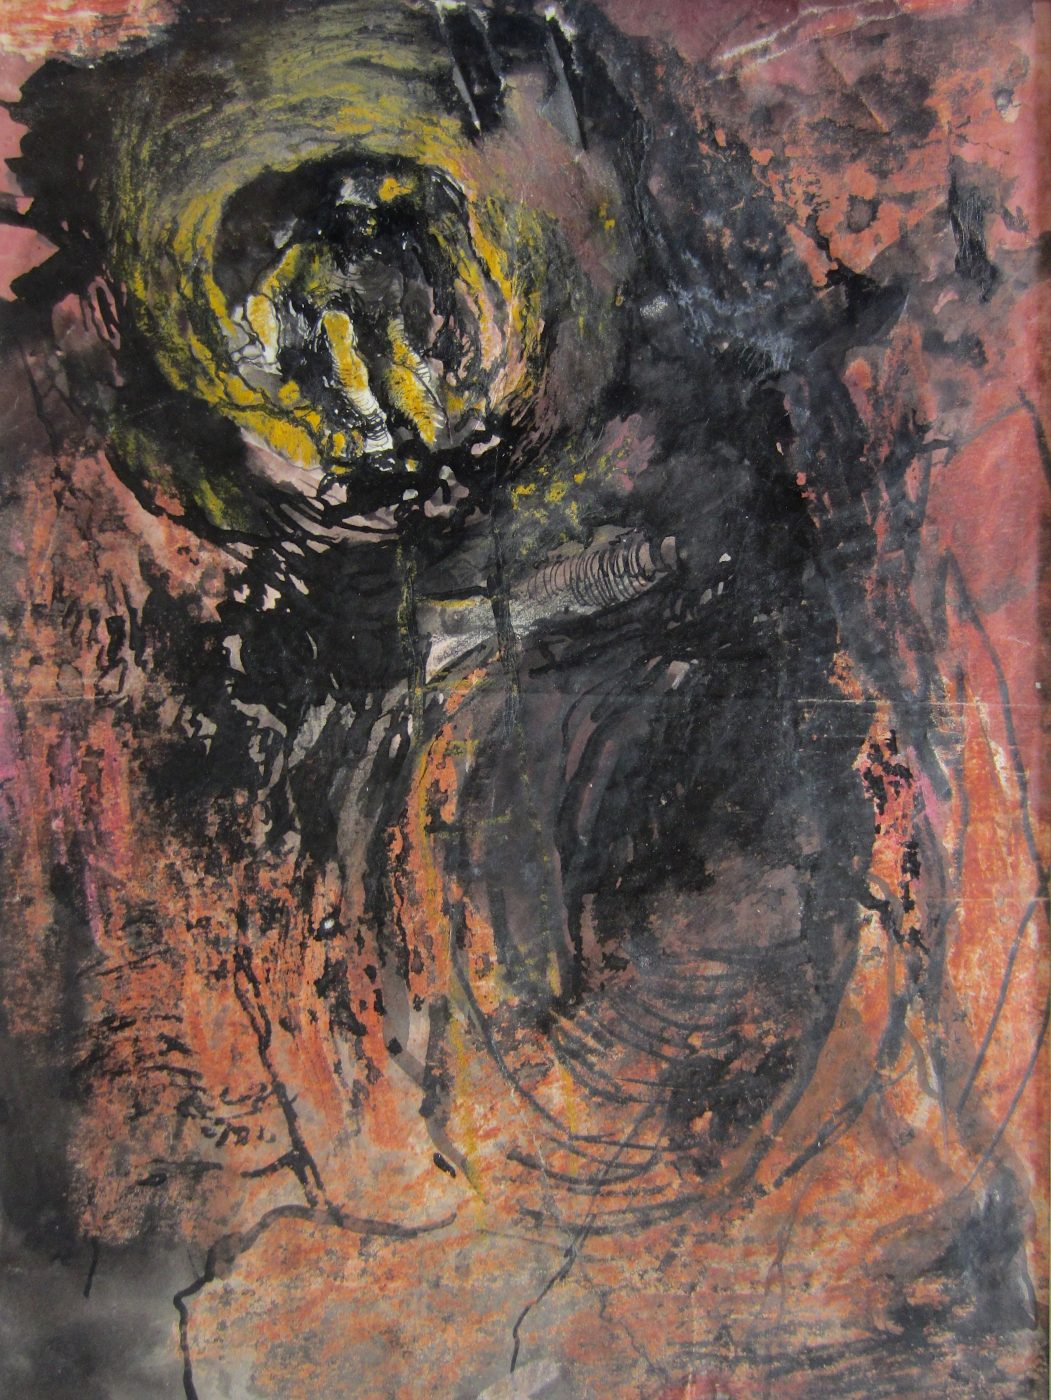 Graham Sutherland, OM (1903-1980), Study: Tin Mine: Miner Approaching